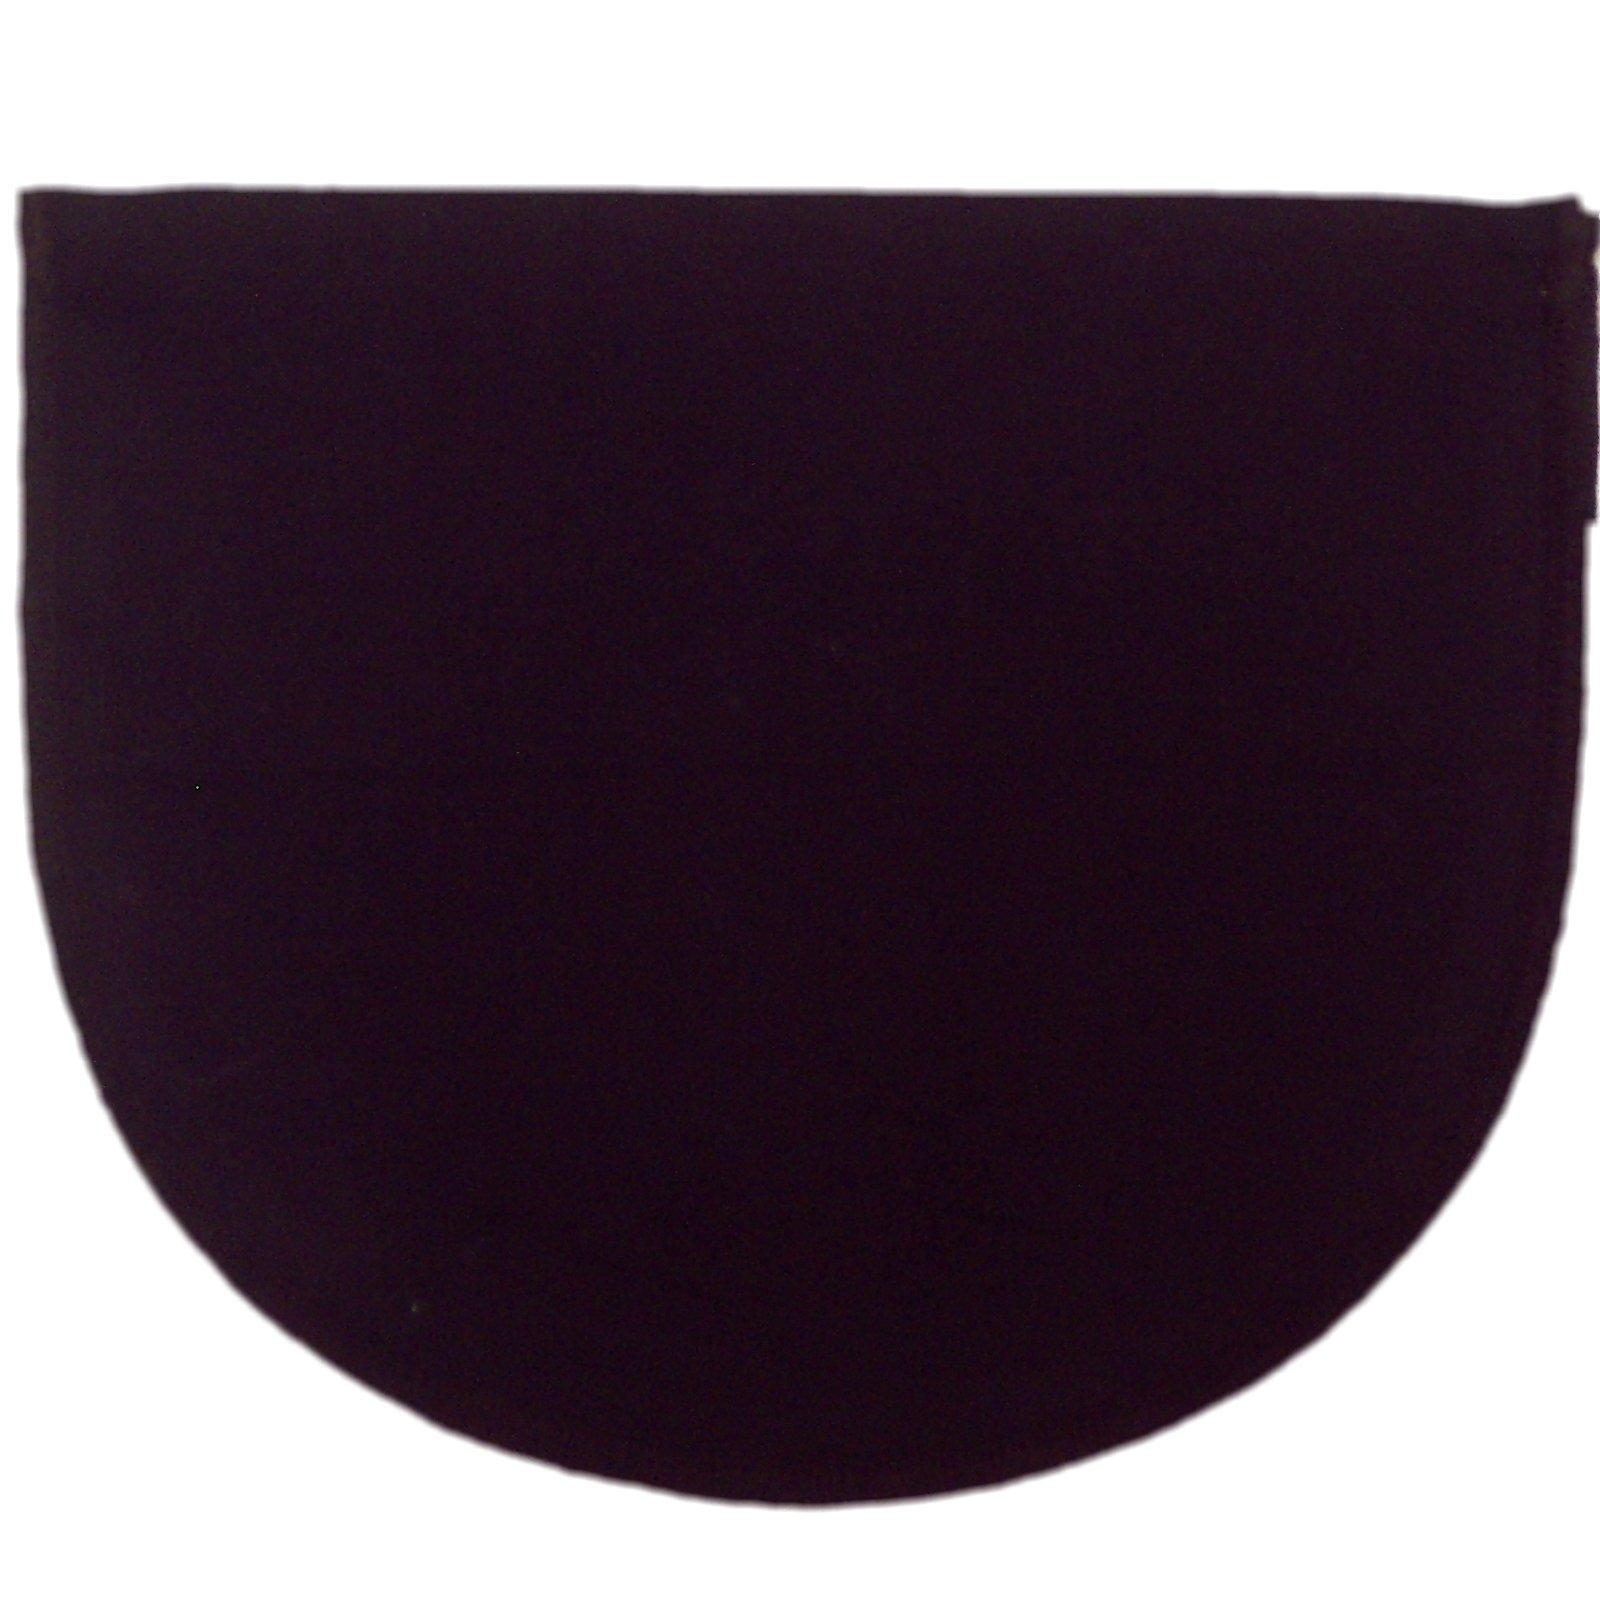 Chemisettes by Anne Modesty Panel Mock Camisole Bra Insert Cotton Black Sz D/XL